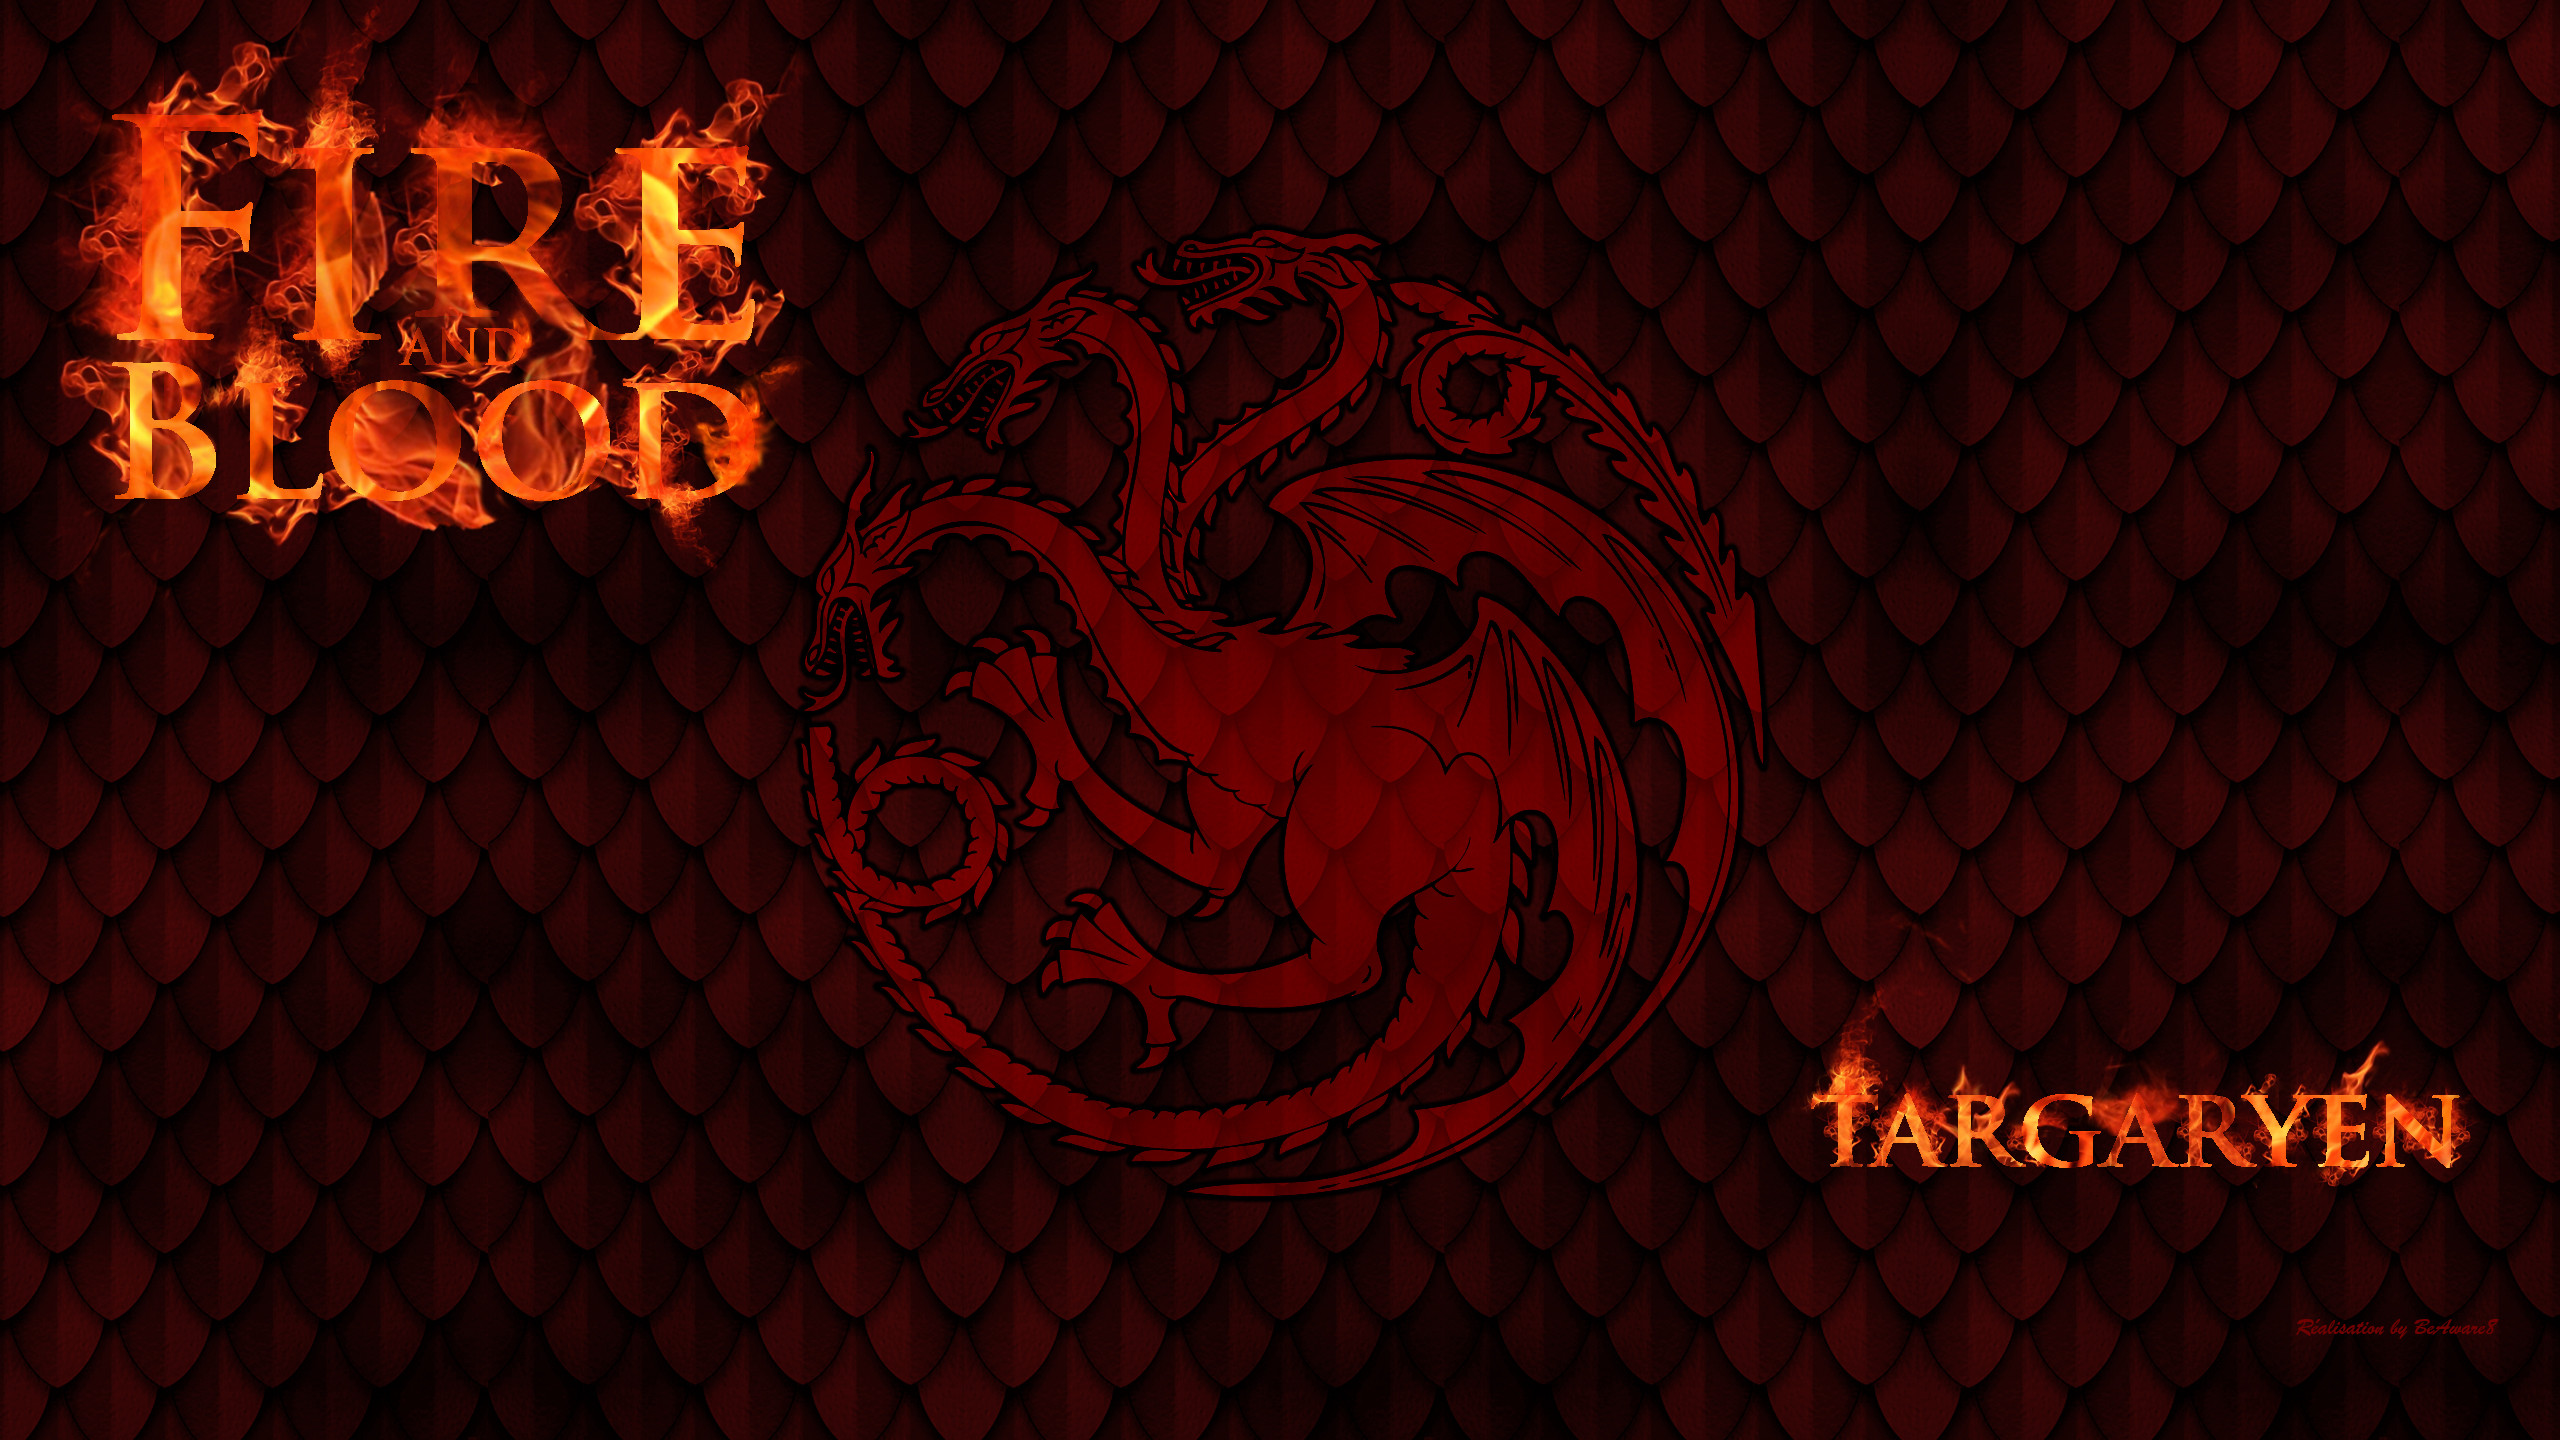 … Game Of Thrones – House Targaryen by BeAware8